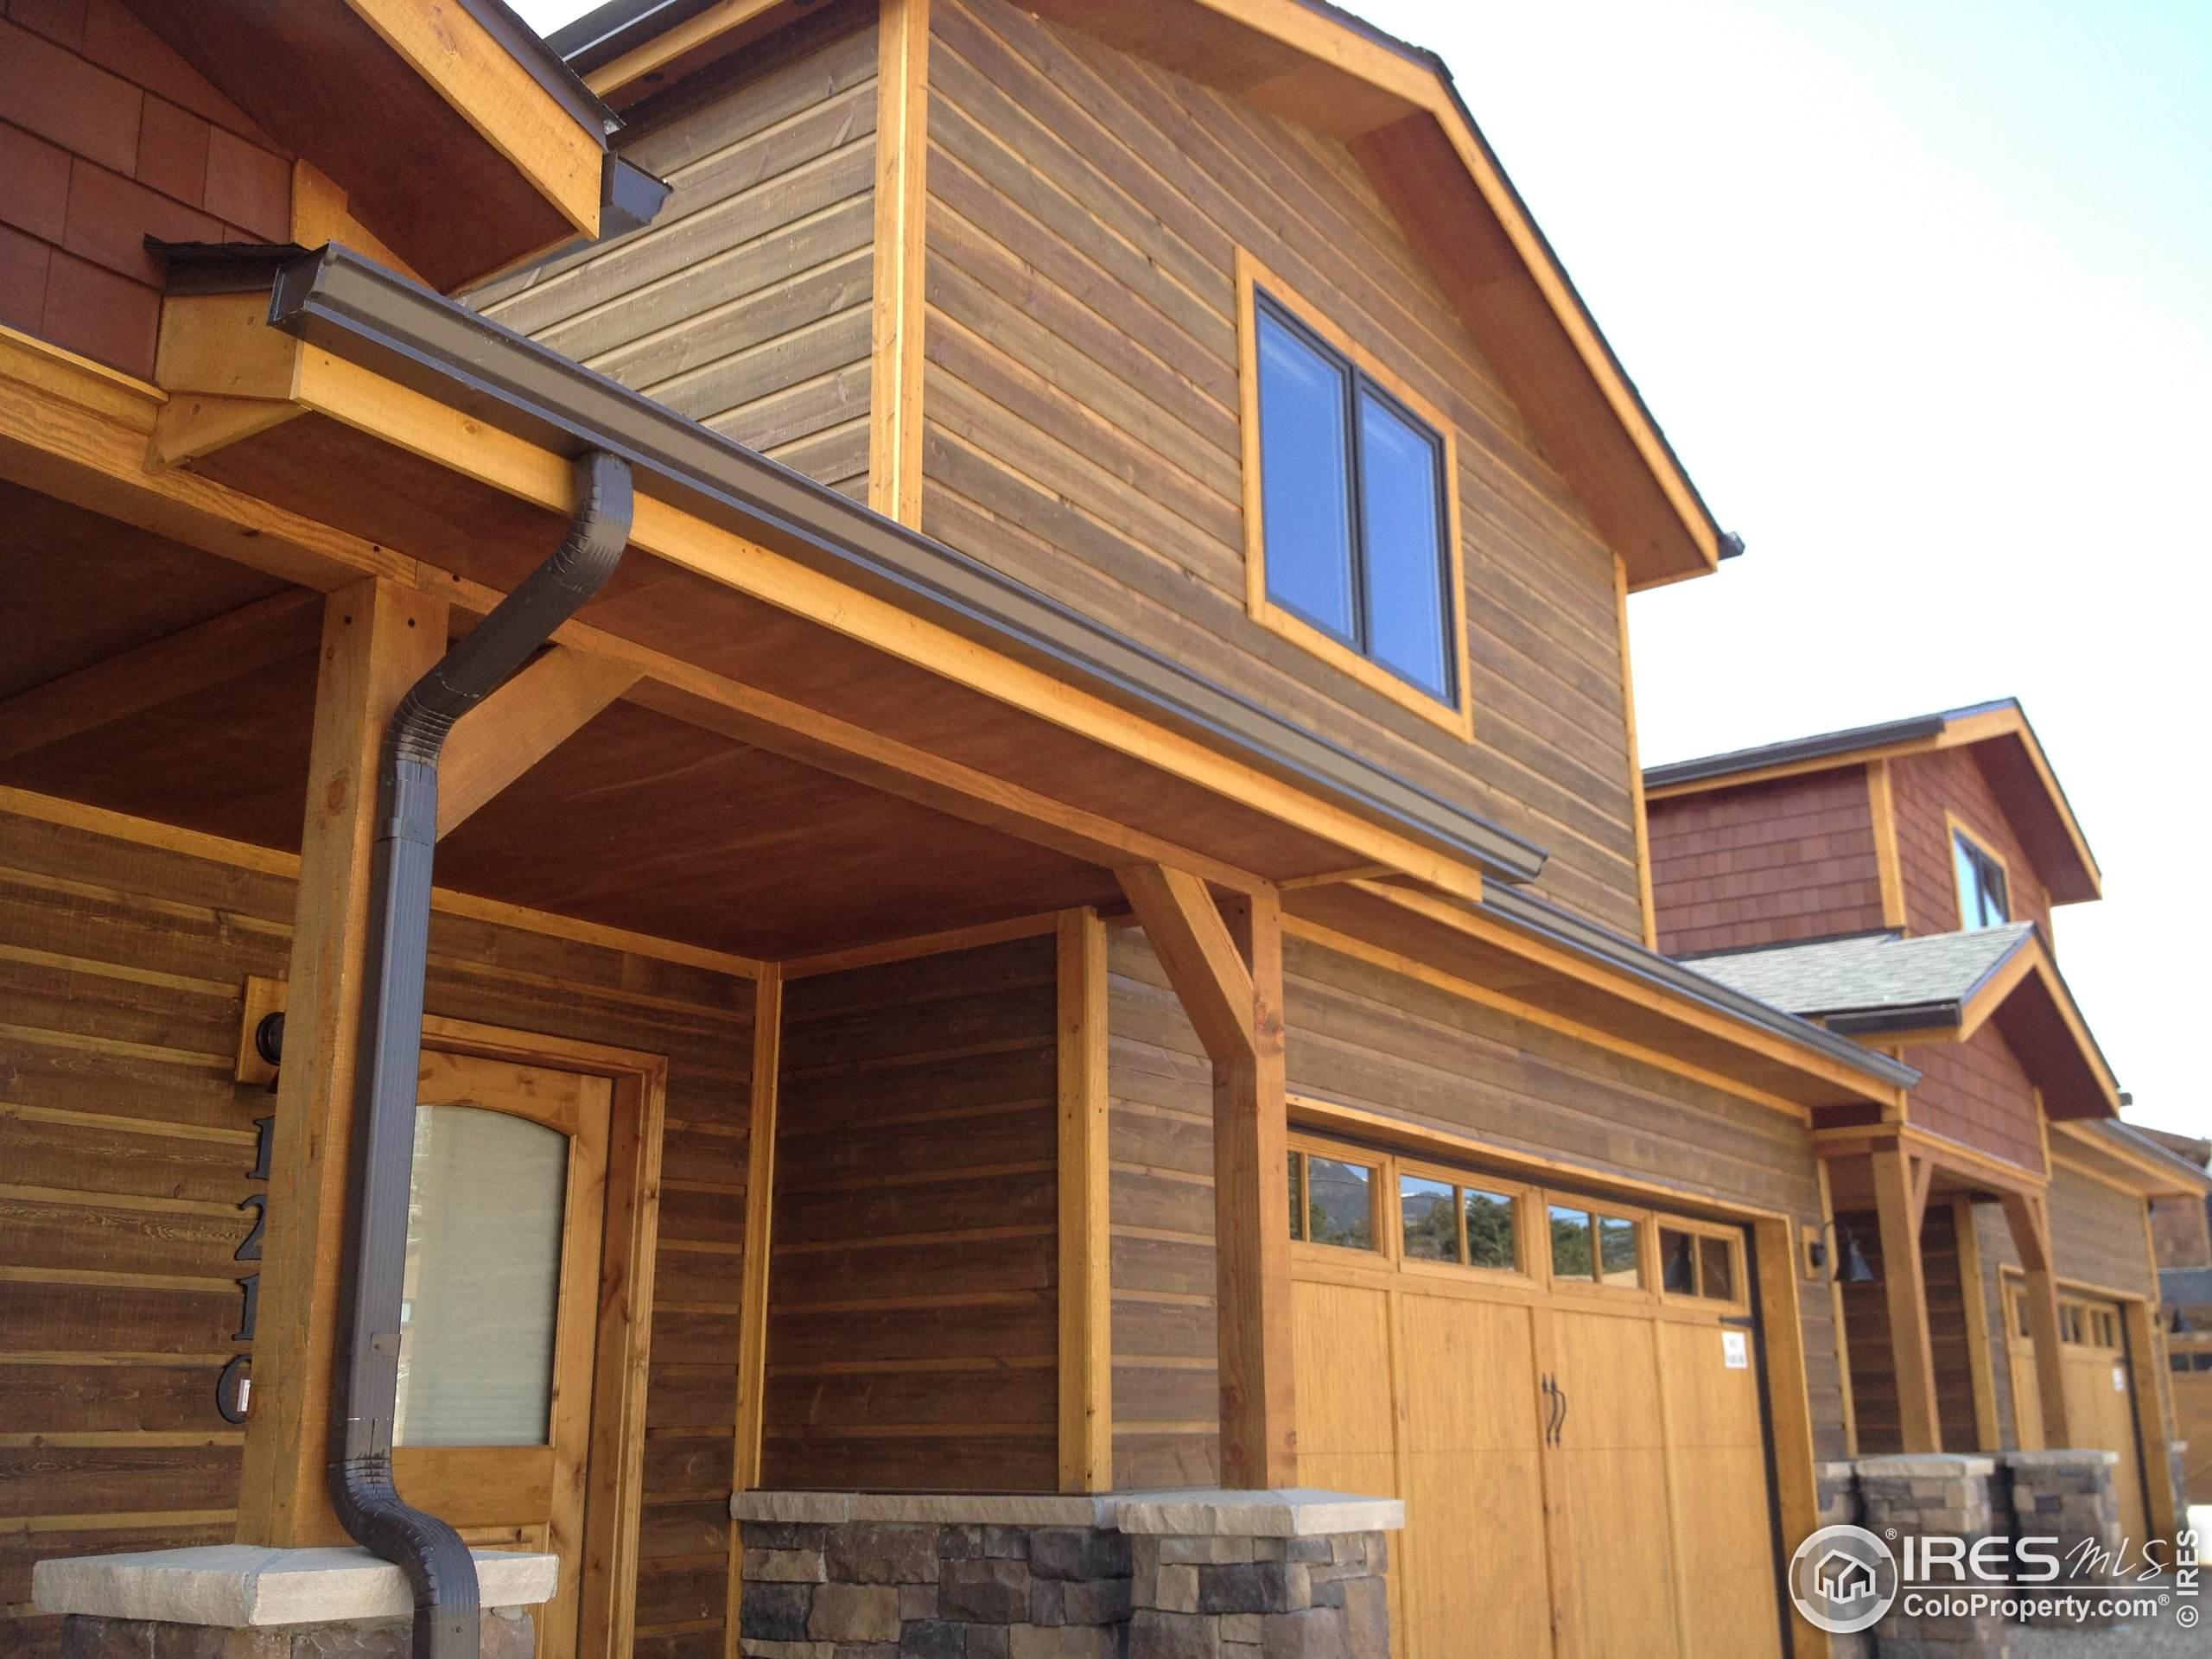 1402 Tahr Dr, Severance, CO 80550 (MLS #925902) :: 8z Real Estate